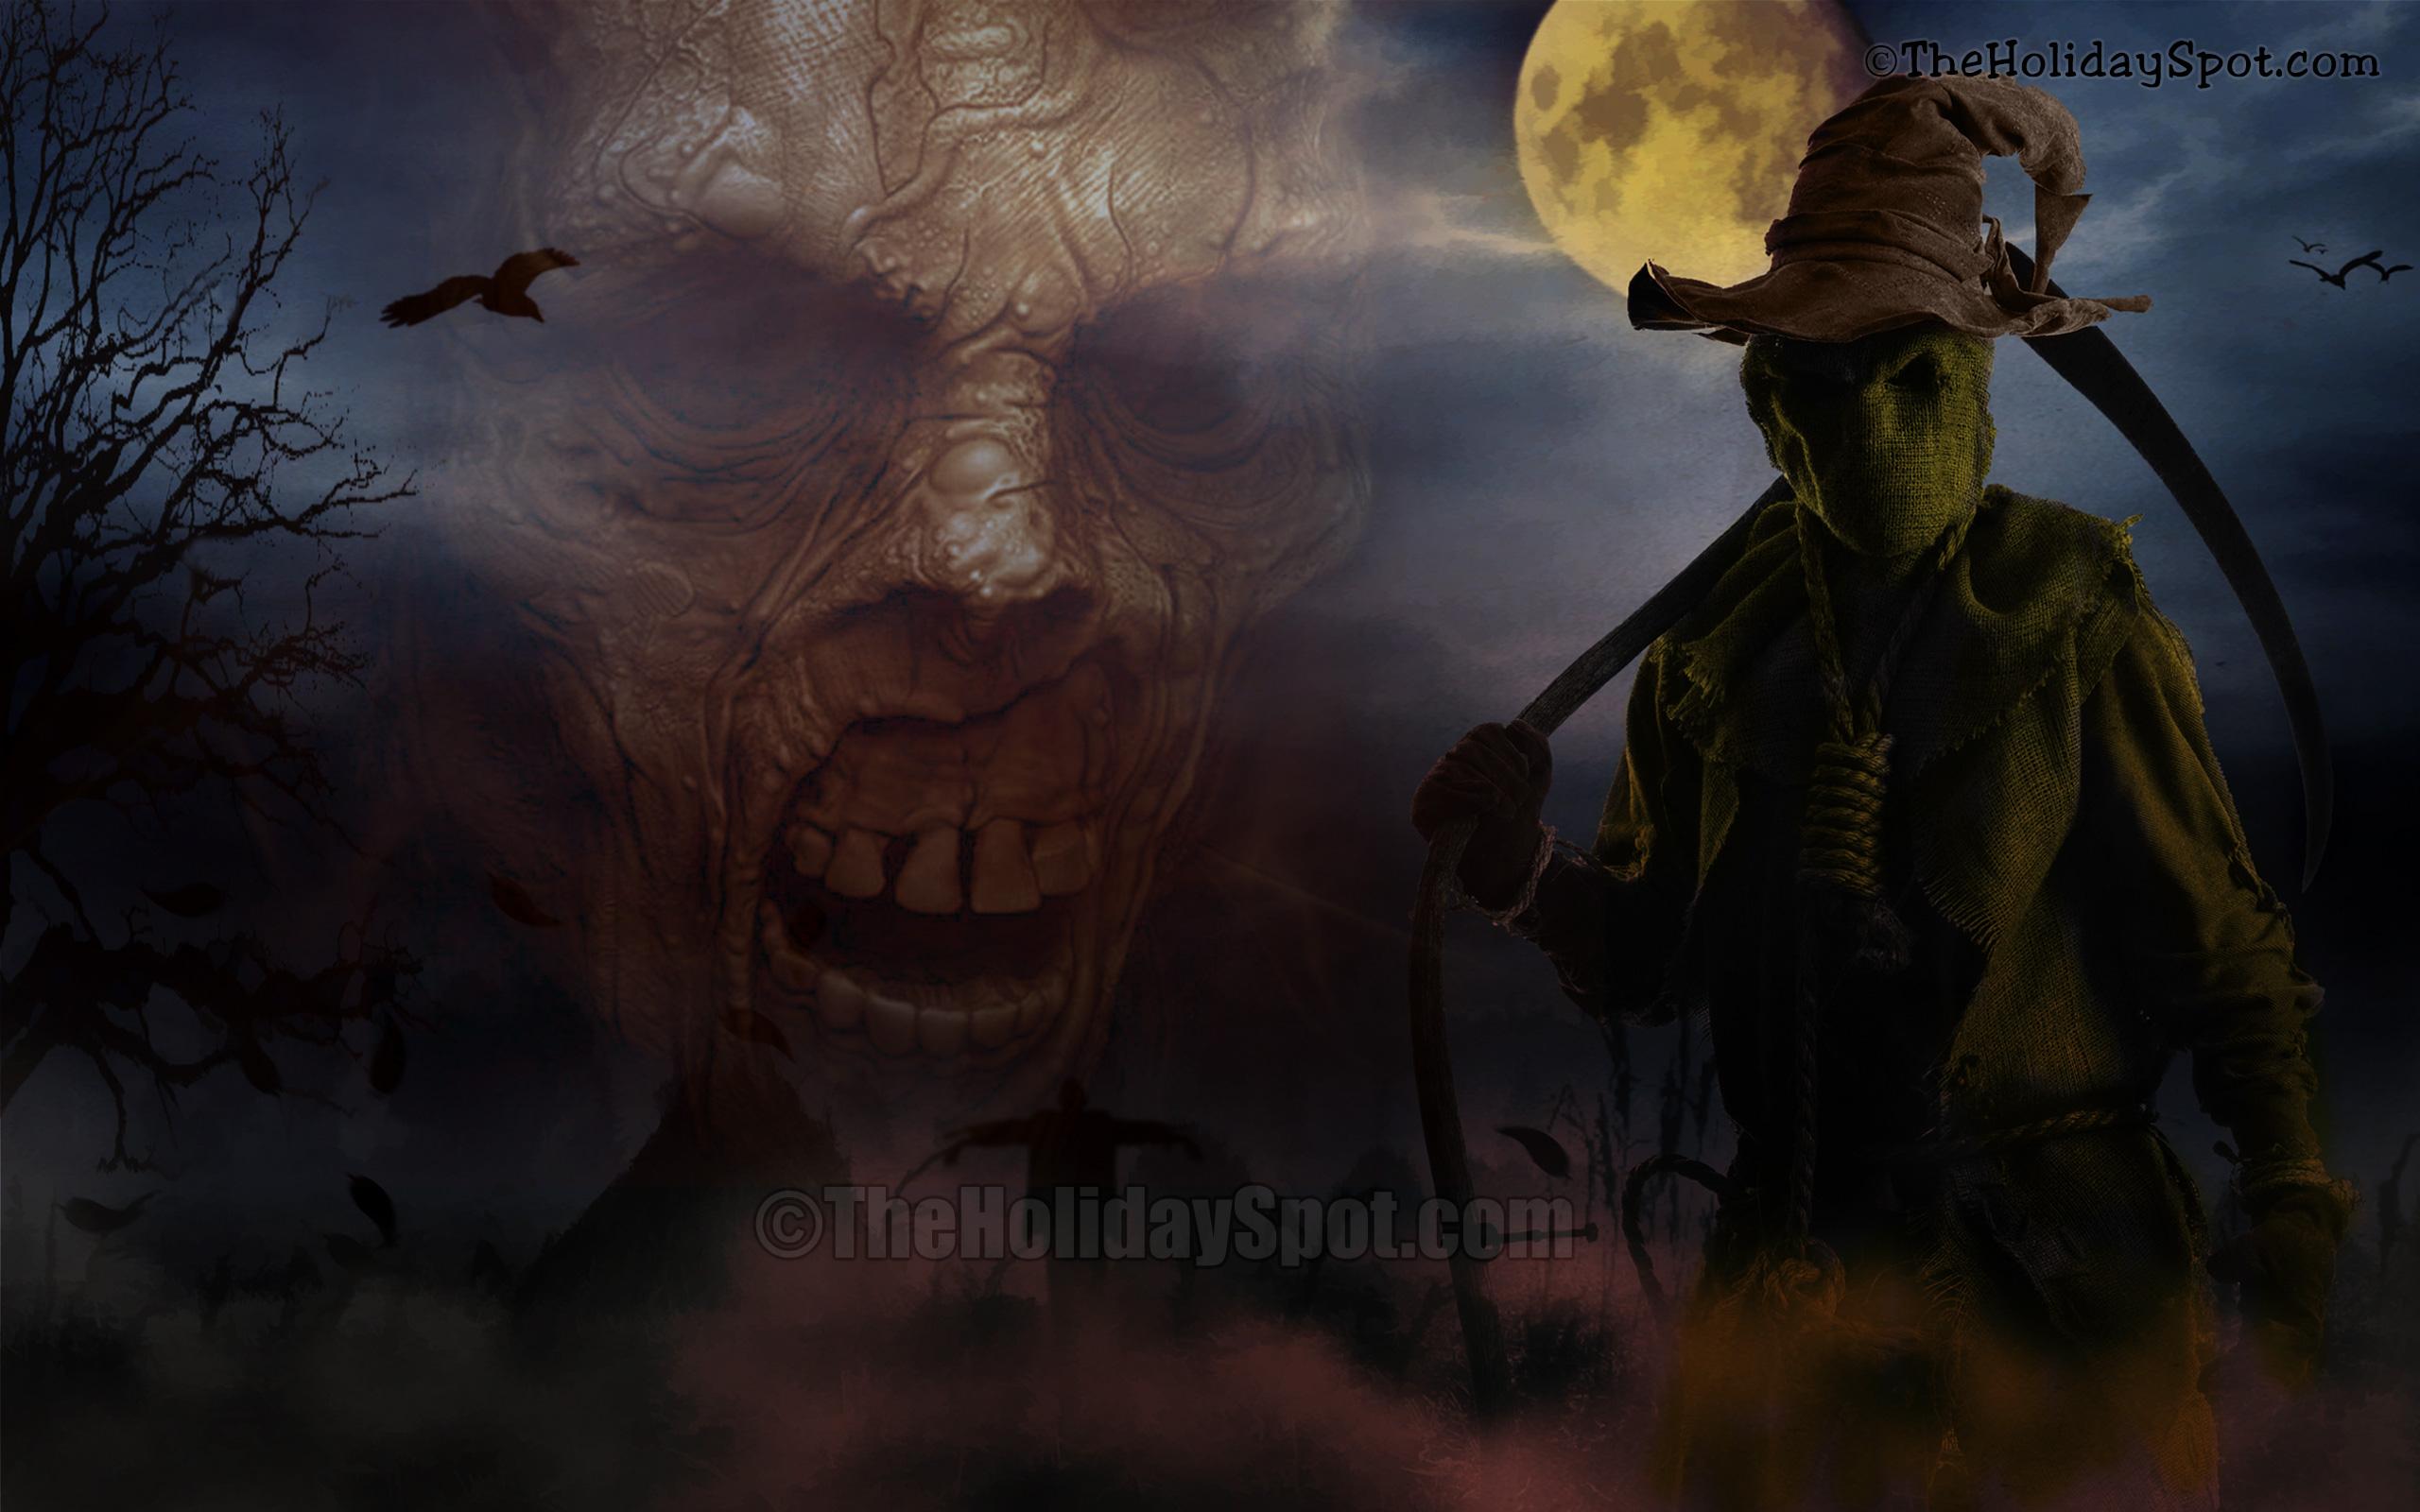 Wonderful Wallpaper Halloween Home Screen - halloween-wallpaper-06  Snapshot_434617.jpg